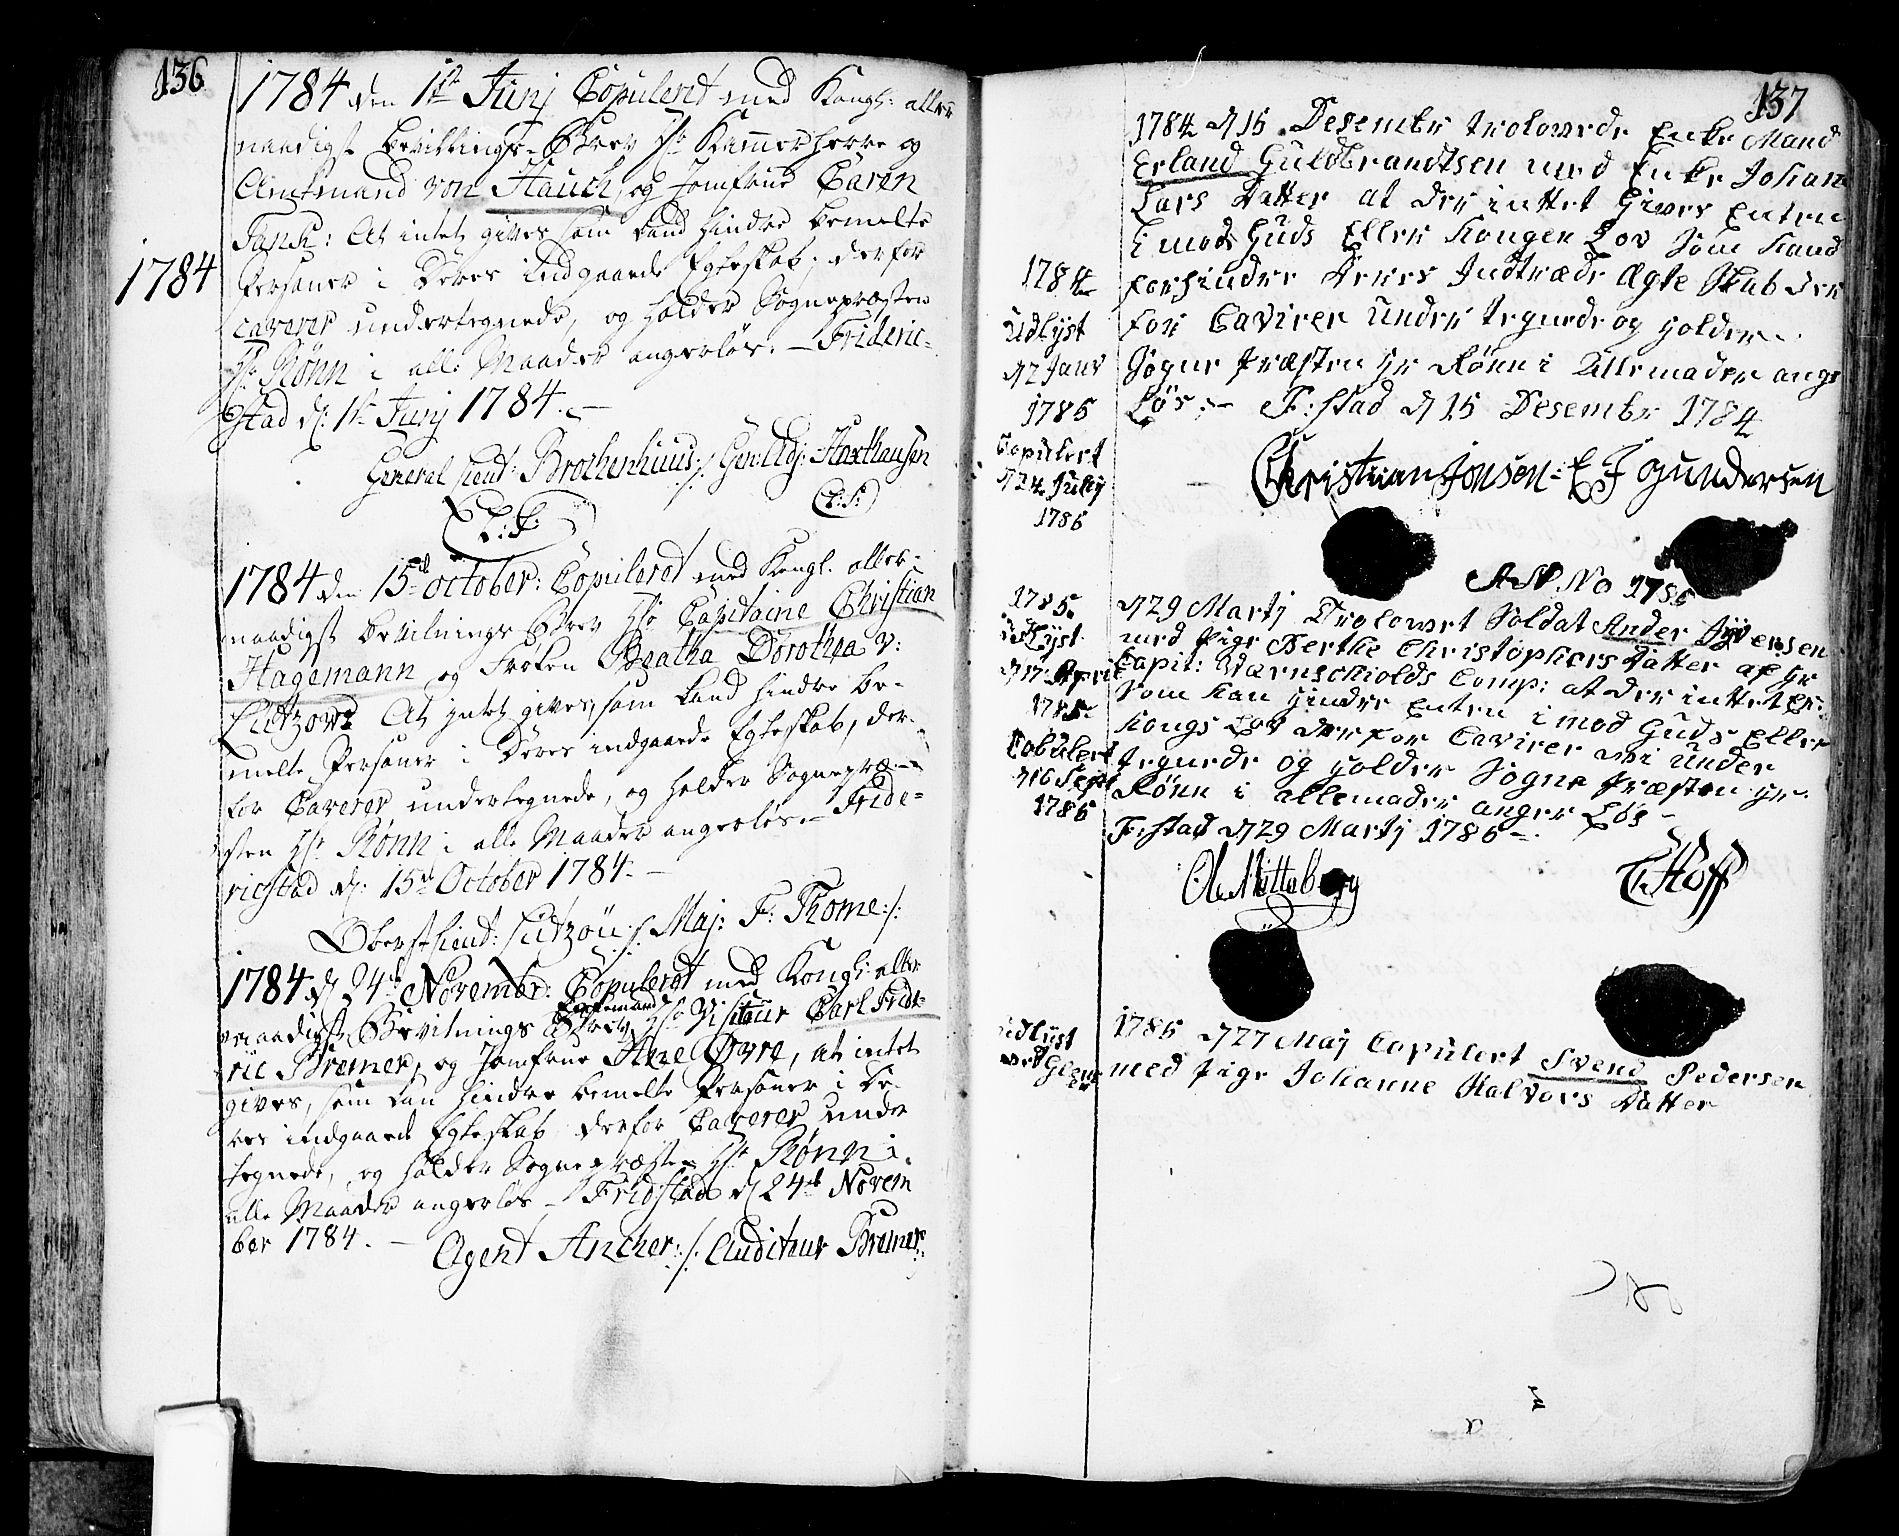 SAO, Fredrikstad prestekontor Kirkebøker, F/Fa/L0002: Ministerialbok nr. 2, 1750-1804, s. 136-137